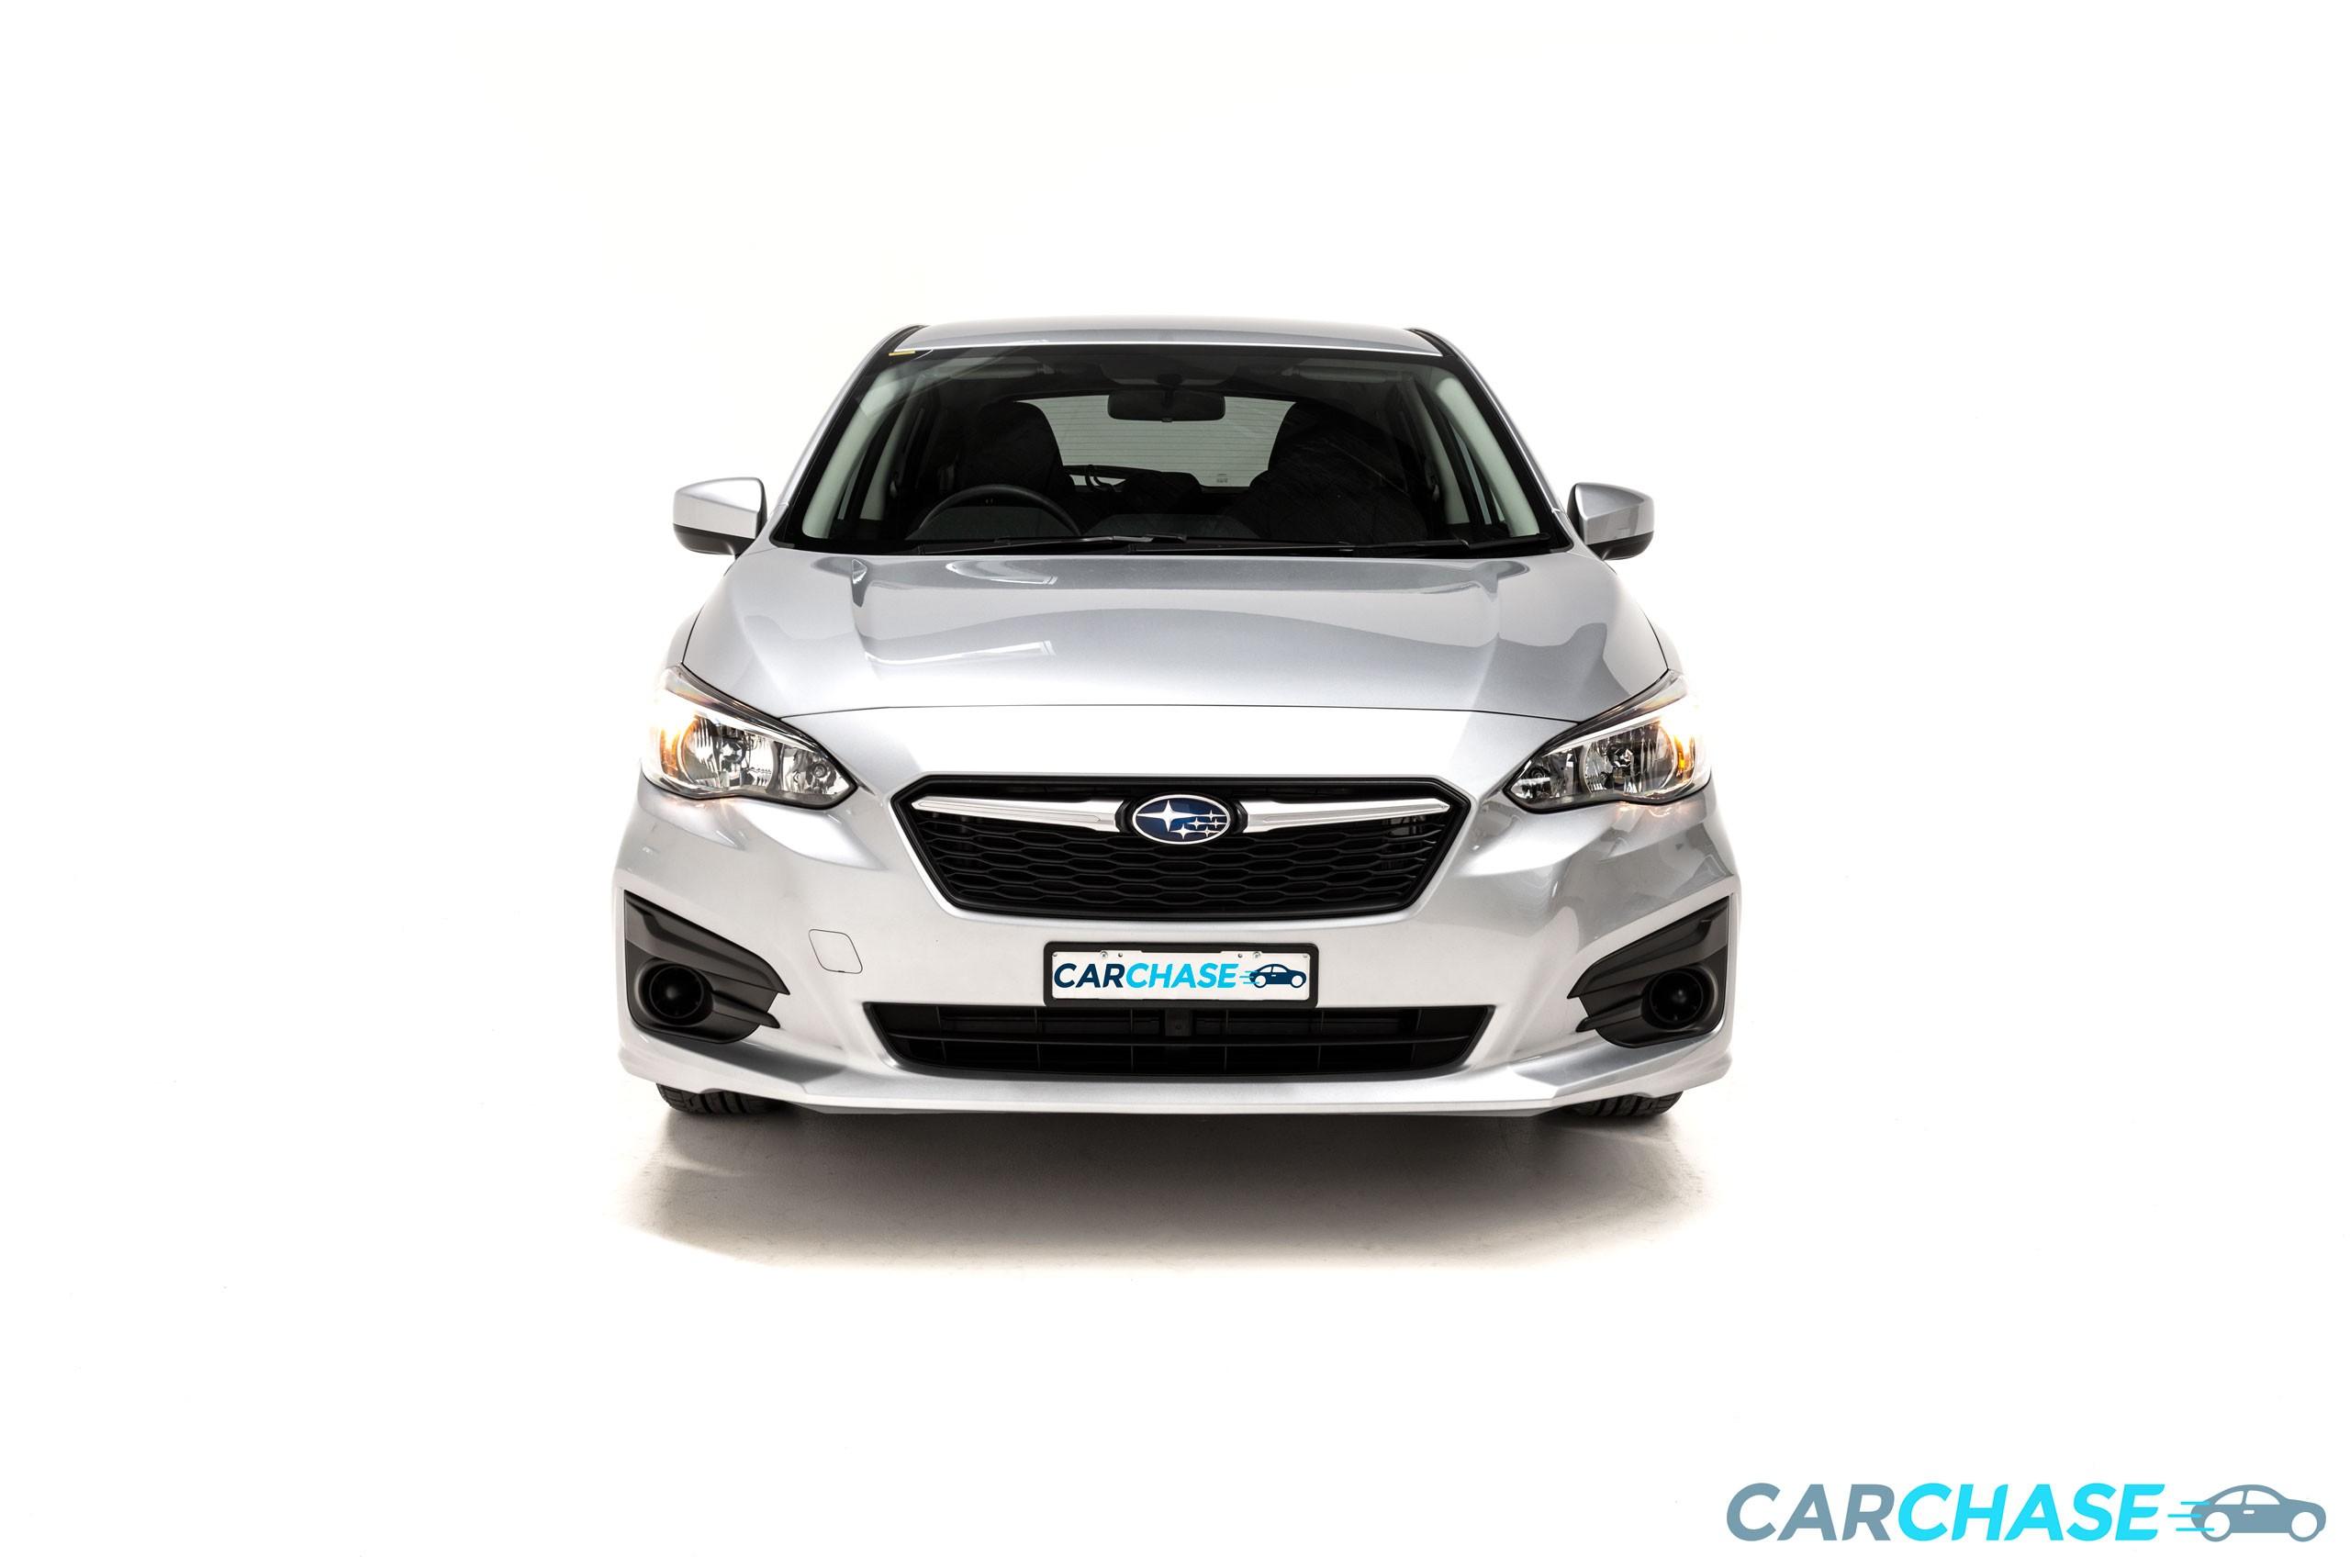 Image of front profile of 2018 Subaru Impreza 2.0i